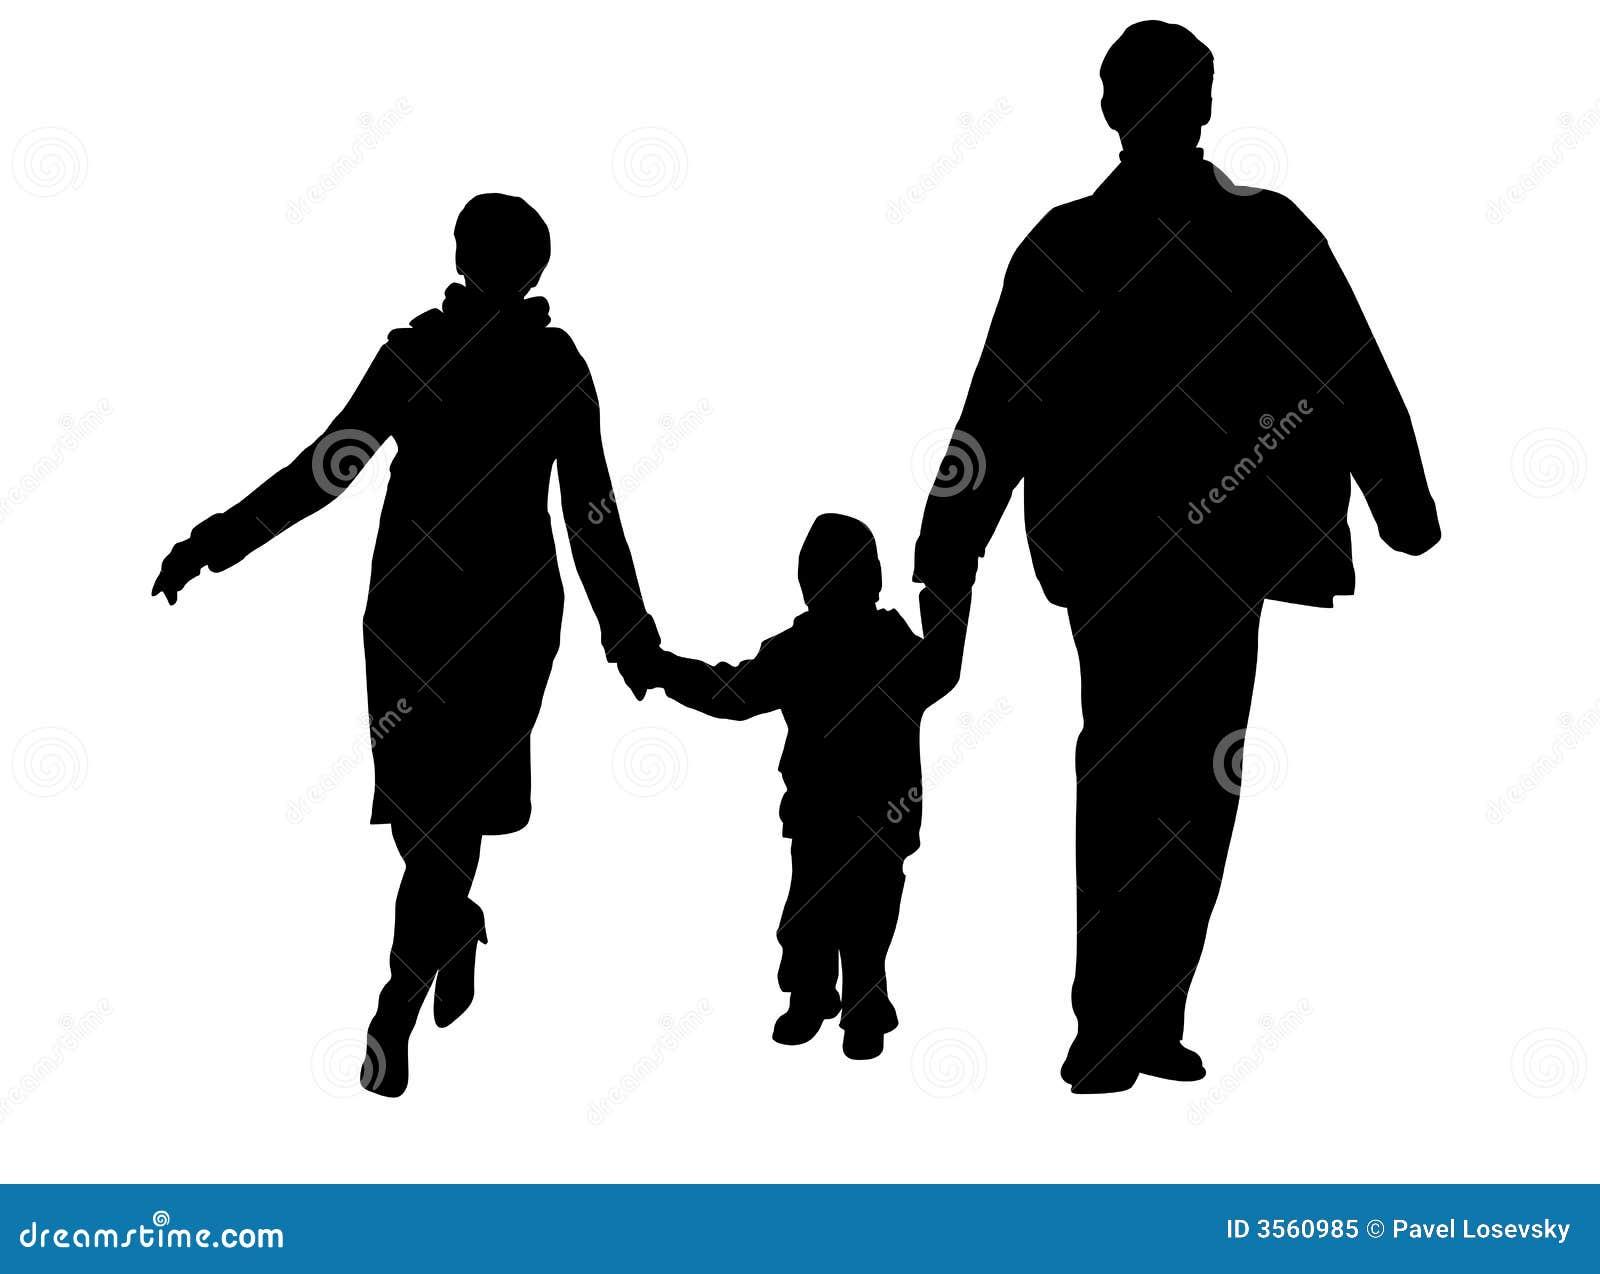 Royalty Free Stock Photo  Walking family silhouetteFamily Walking Silhouette